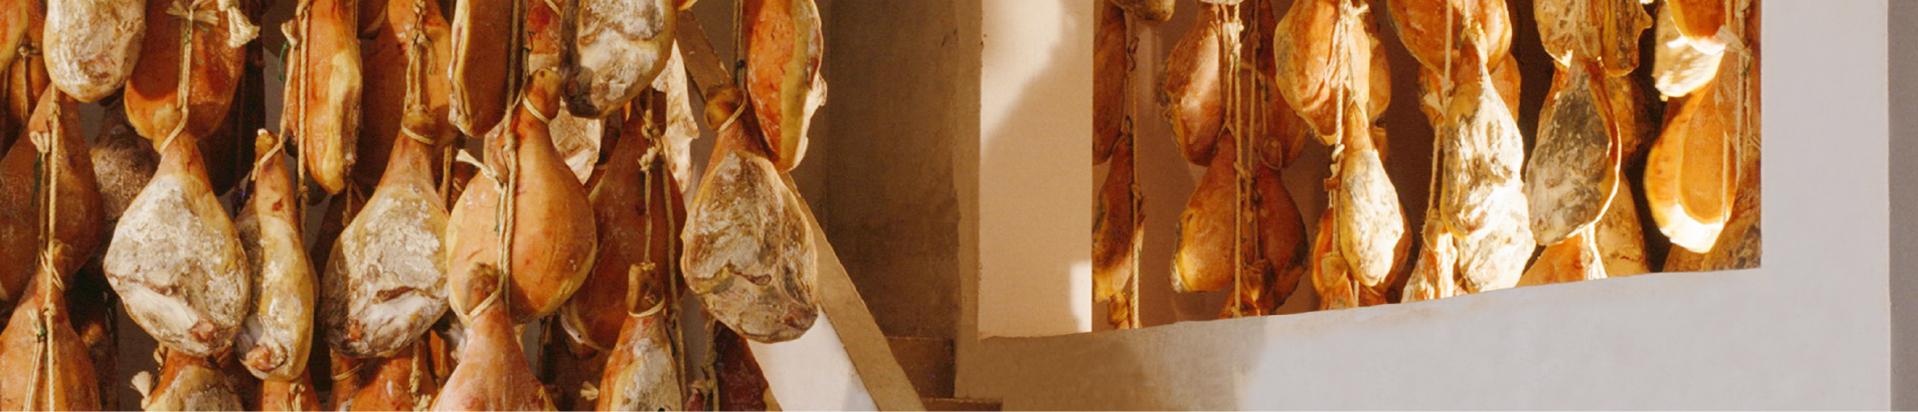 Bodega - Mejor jamón de Teruel